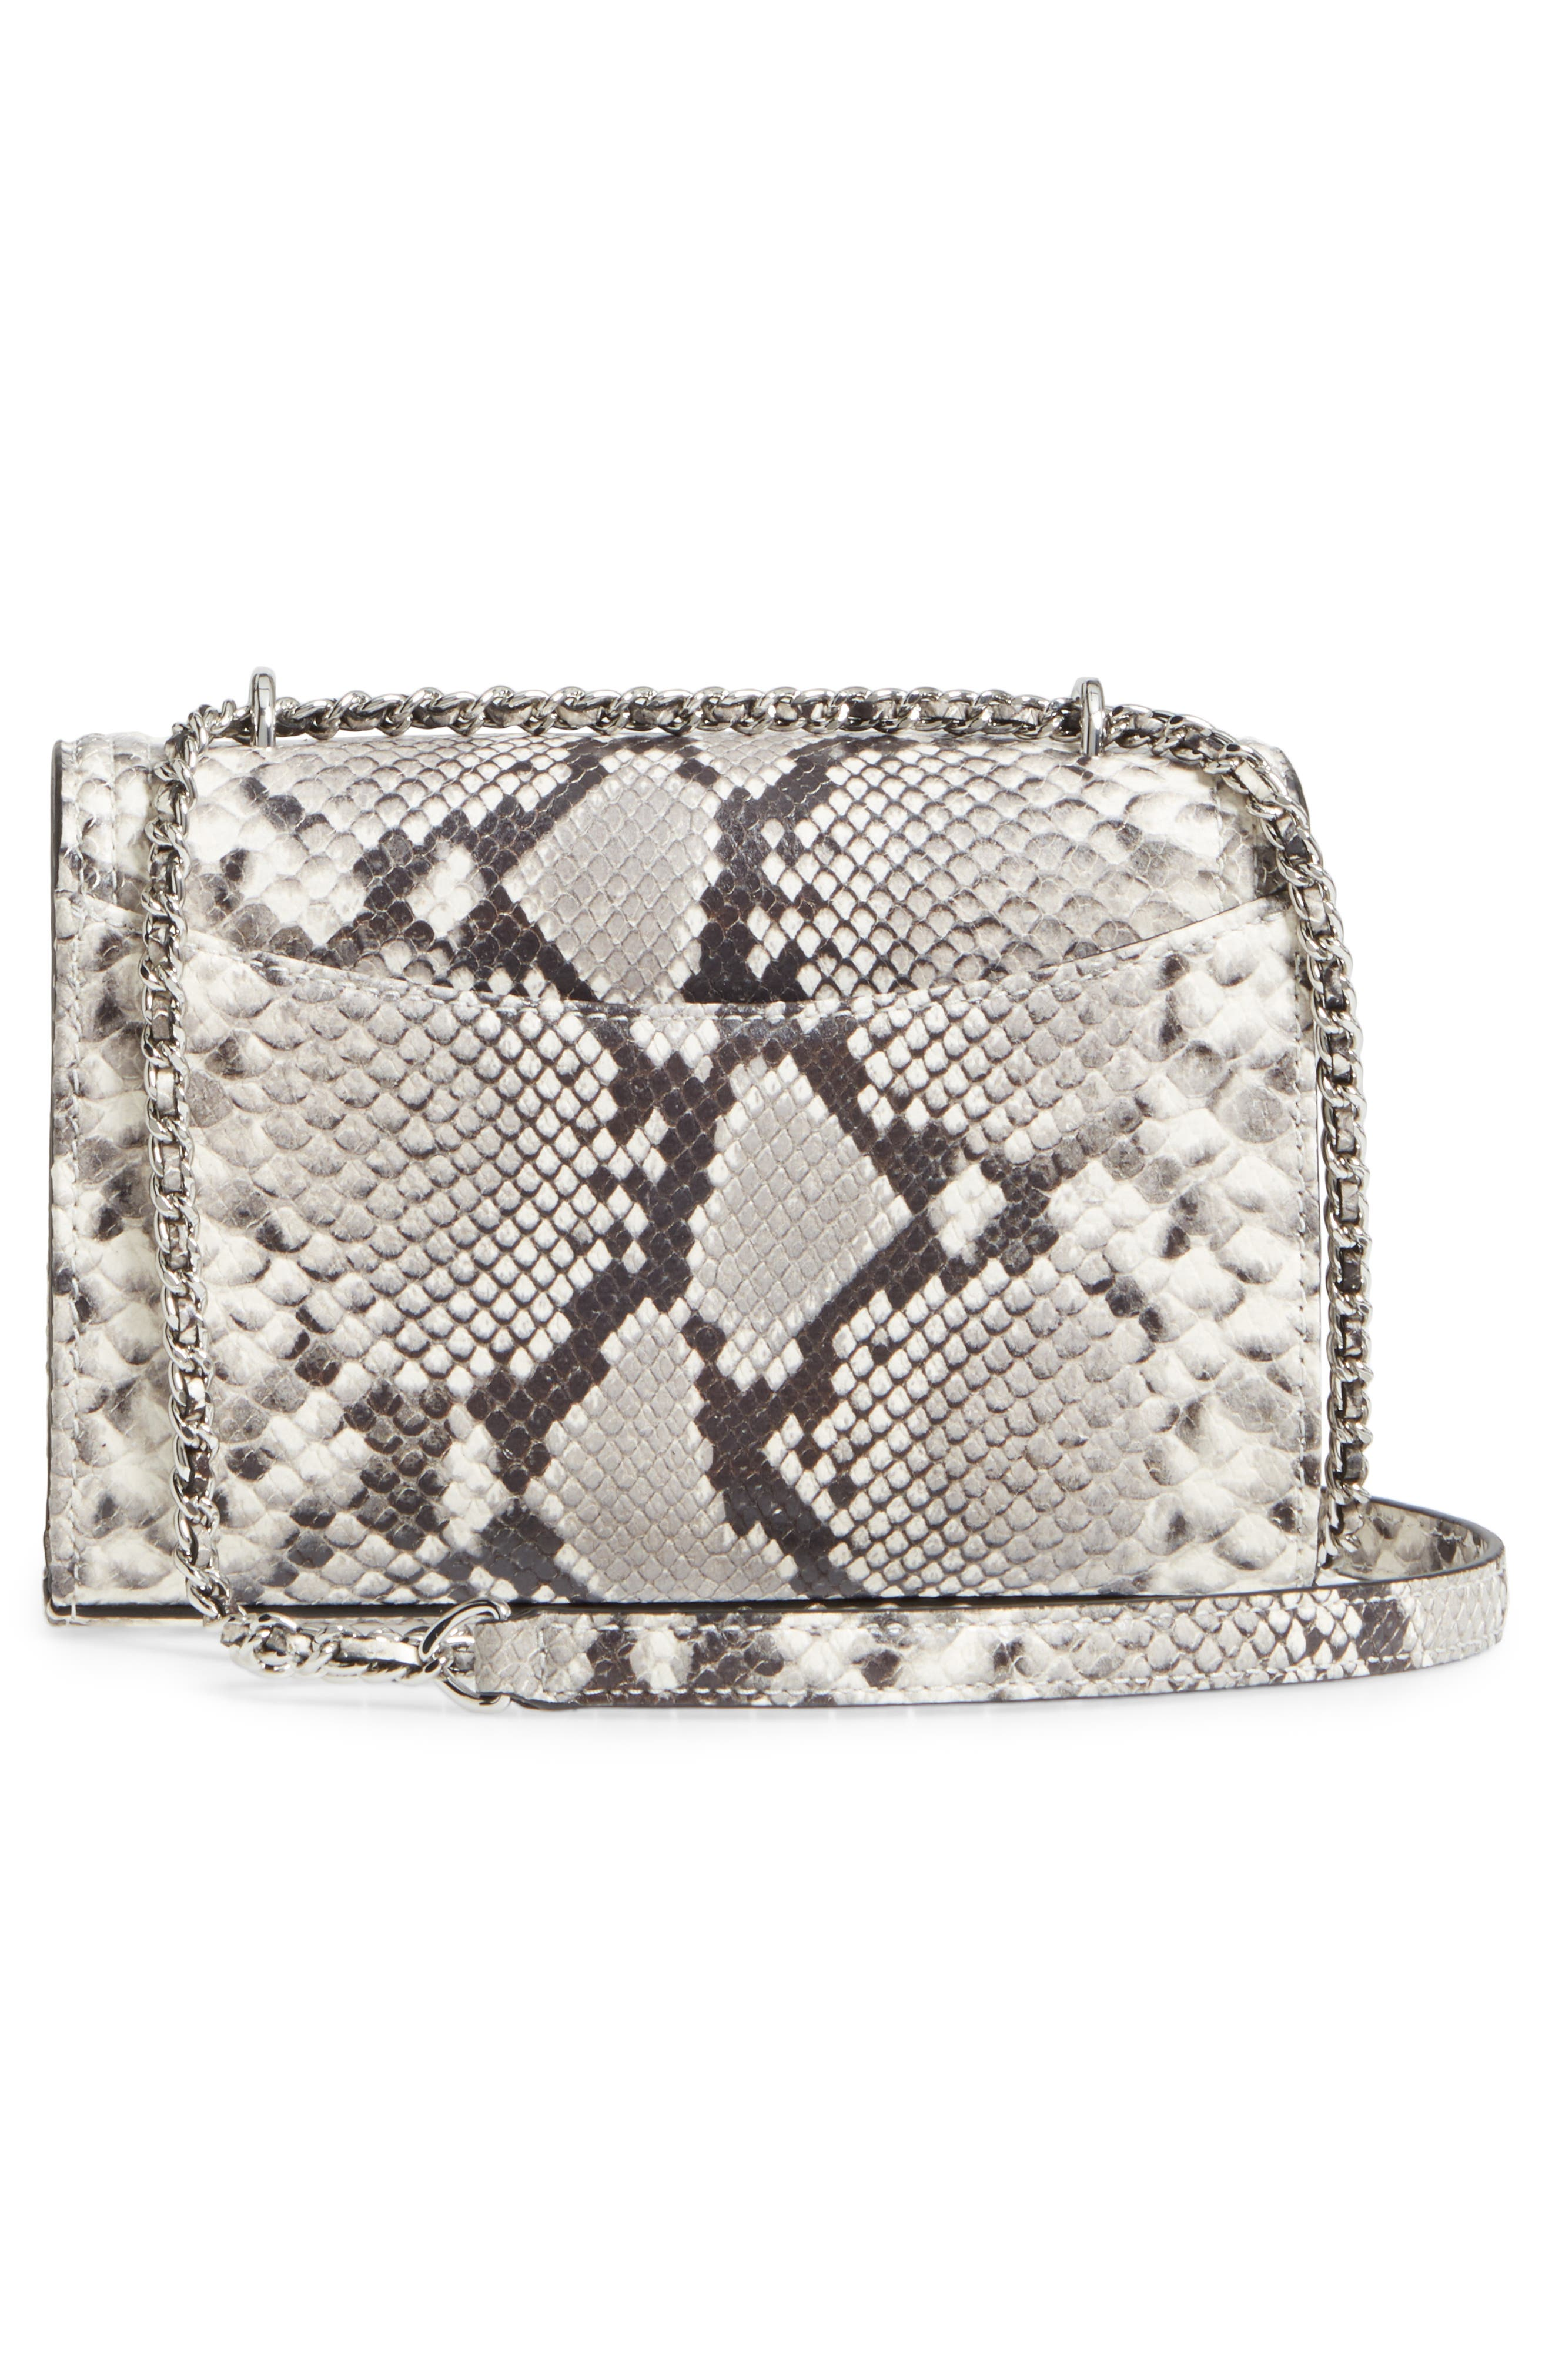 Small Fleming Leather Convertible Shoulder Bag,                             Alternate thumbnail 3, color,                             001